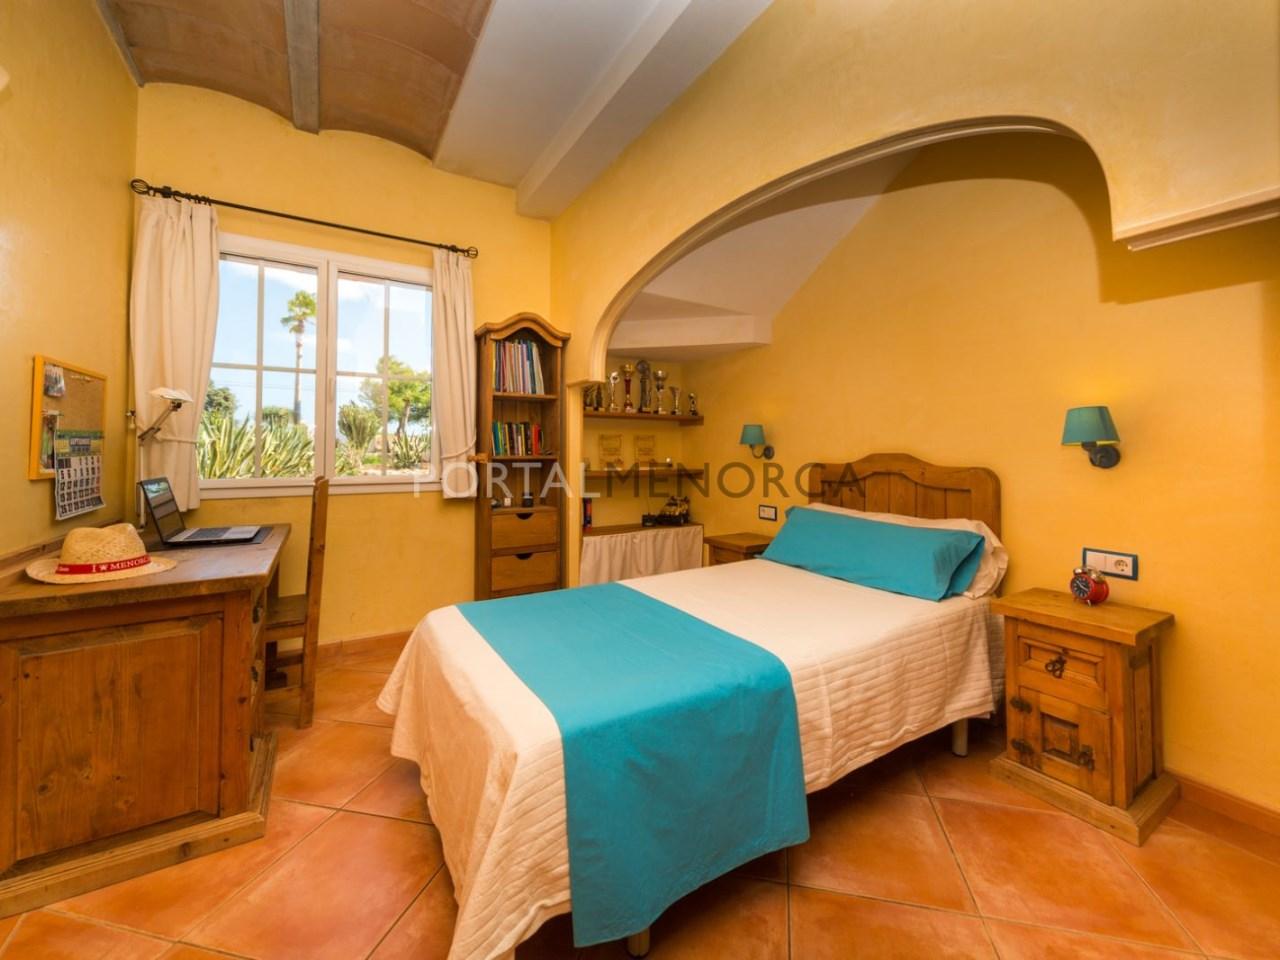 Casa de campo con piscina en Menorca (37 de 41)